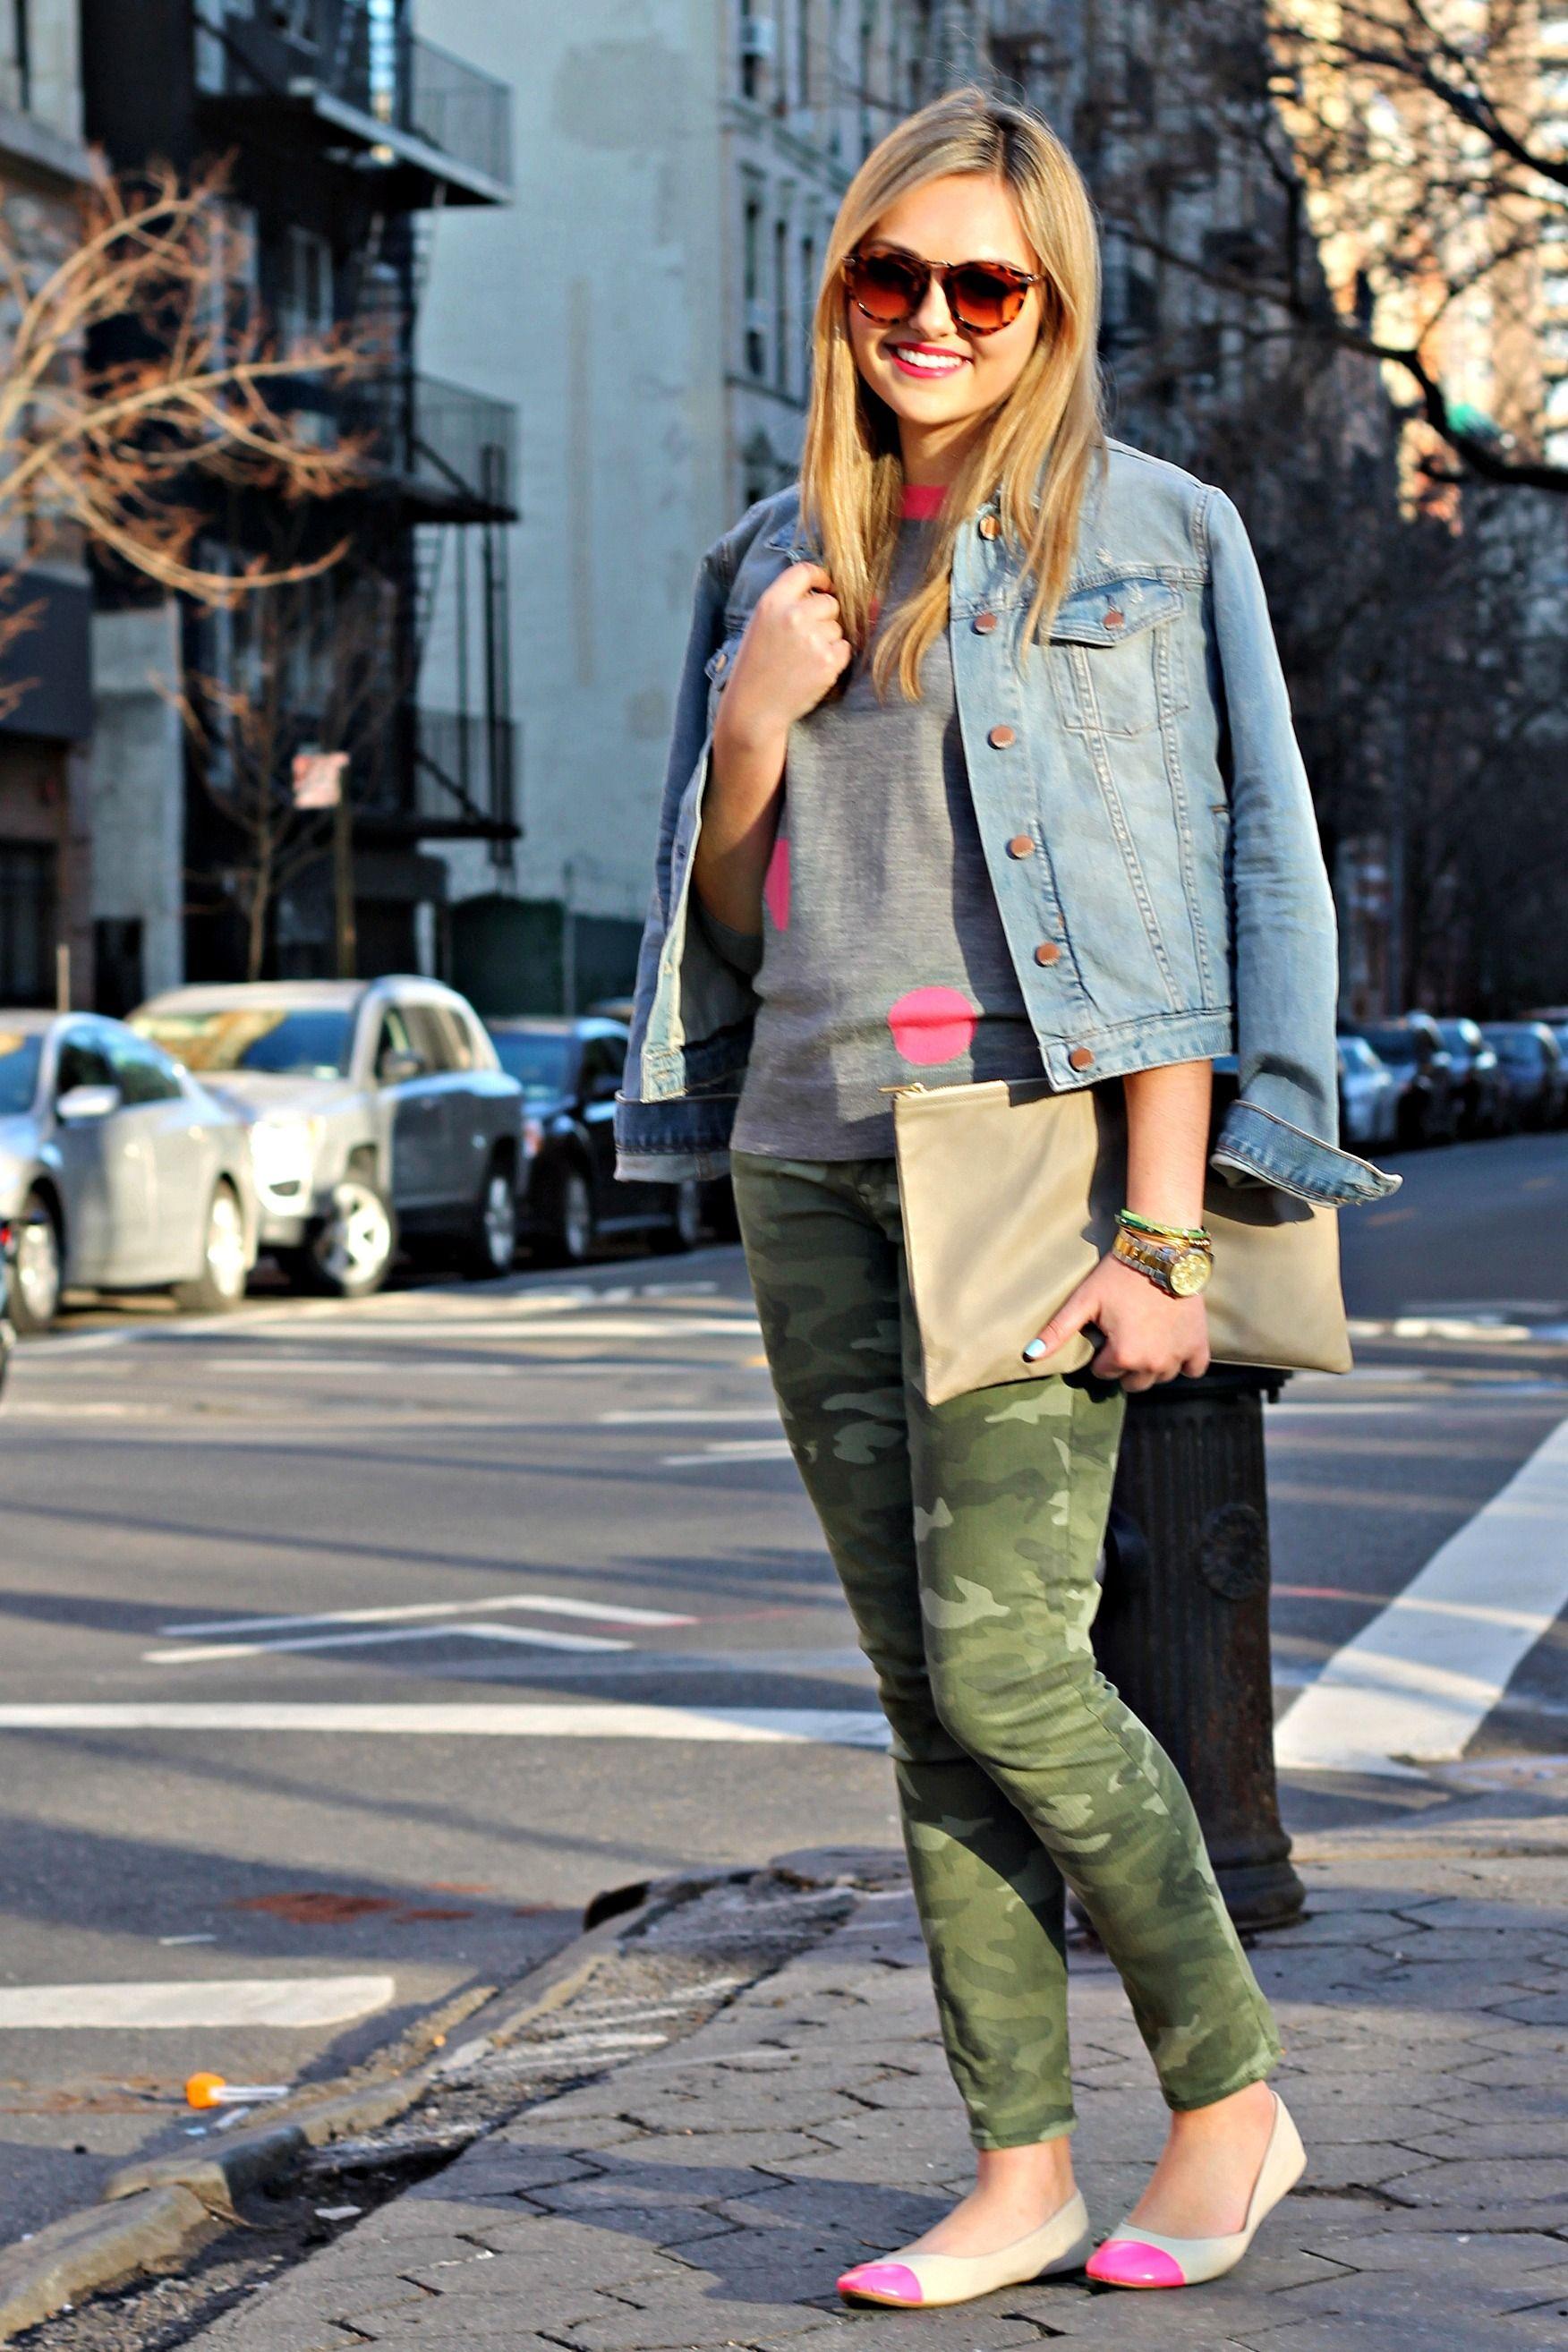 Camo-Pants-Outfit.jpg (1752u00d72628) | CAMO-CARGO OUTFITS | Pinterest | Camo